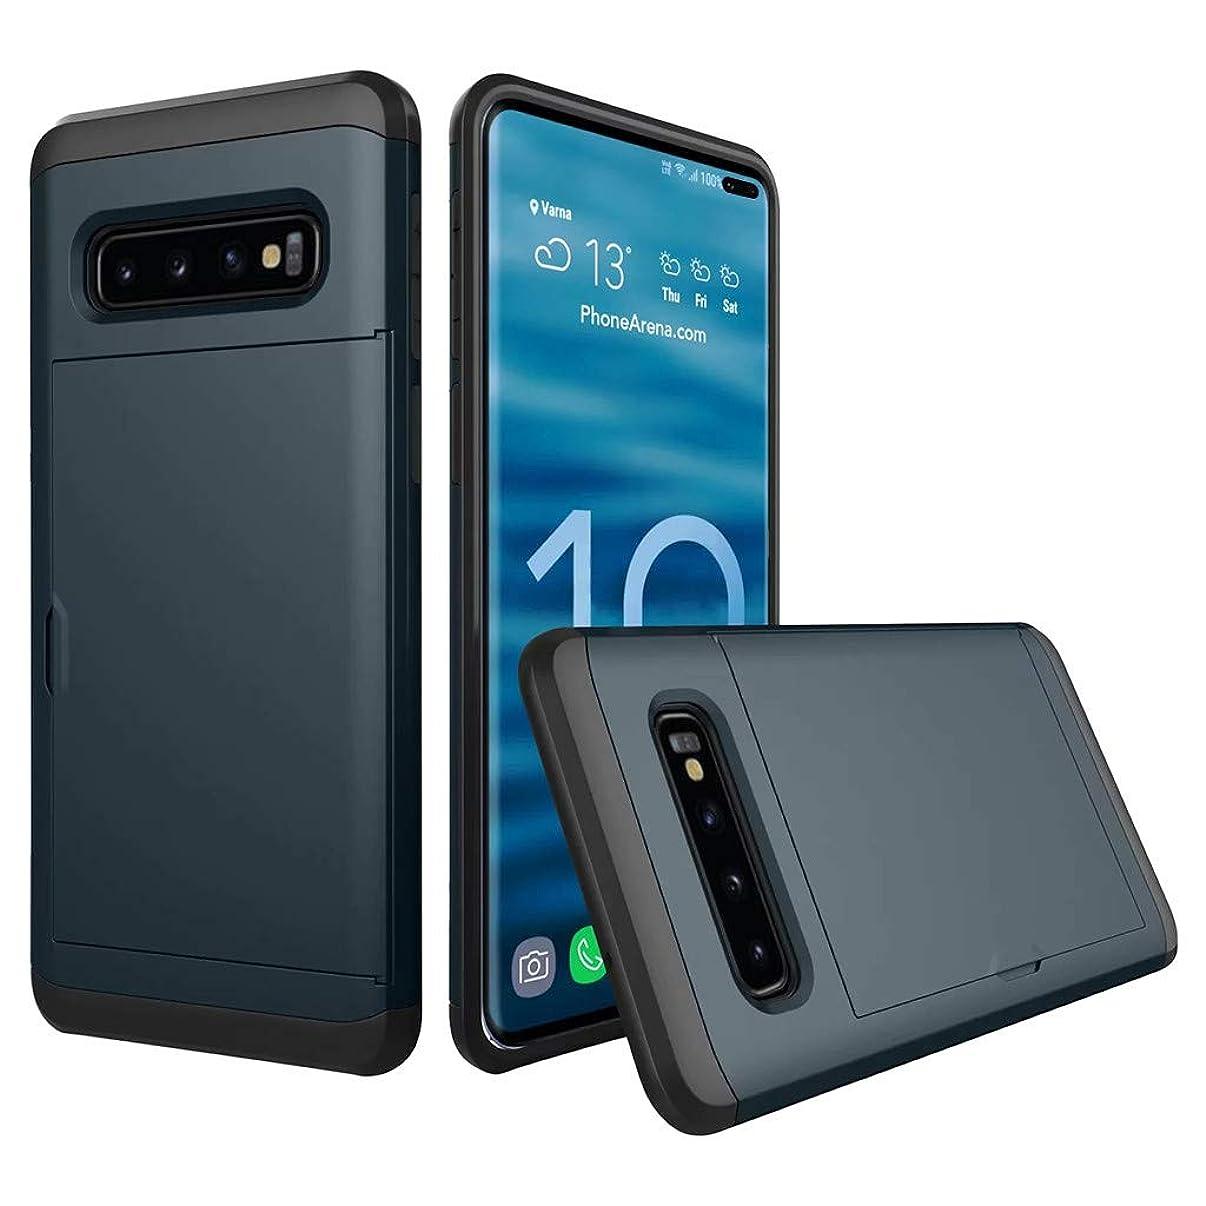 Ecurson Hard PC+Silica Gel Case Cover Card Holder for Samsung Galaxy S10 Plus 6.4 inch,Shock-Absorption Bumper Cover, Anti-Scratch